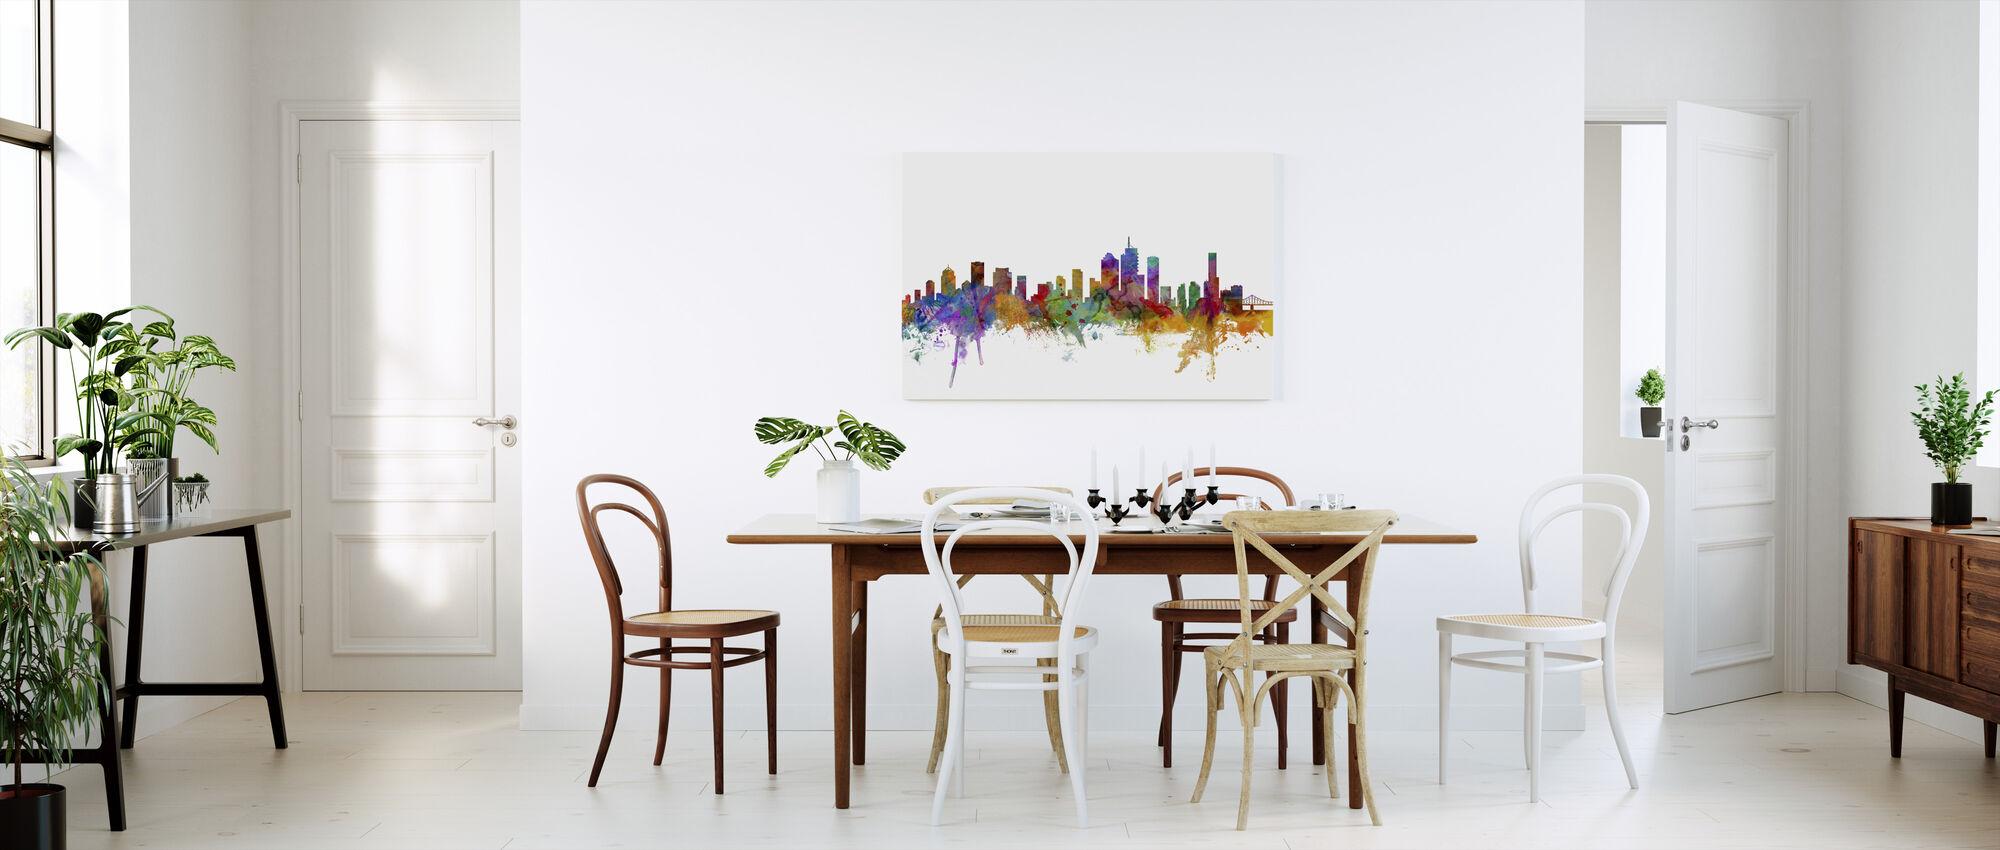 Skyline van Brisbane - Canvas print - Keuken